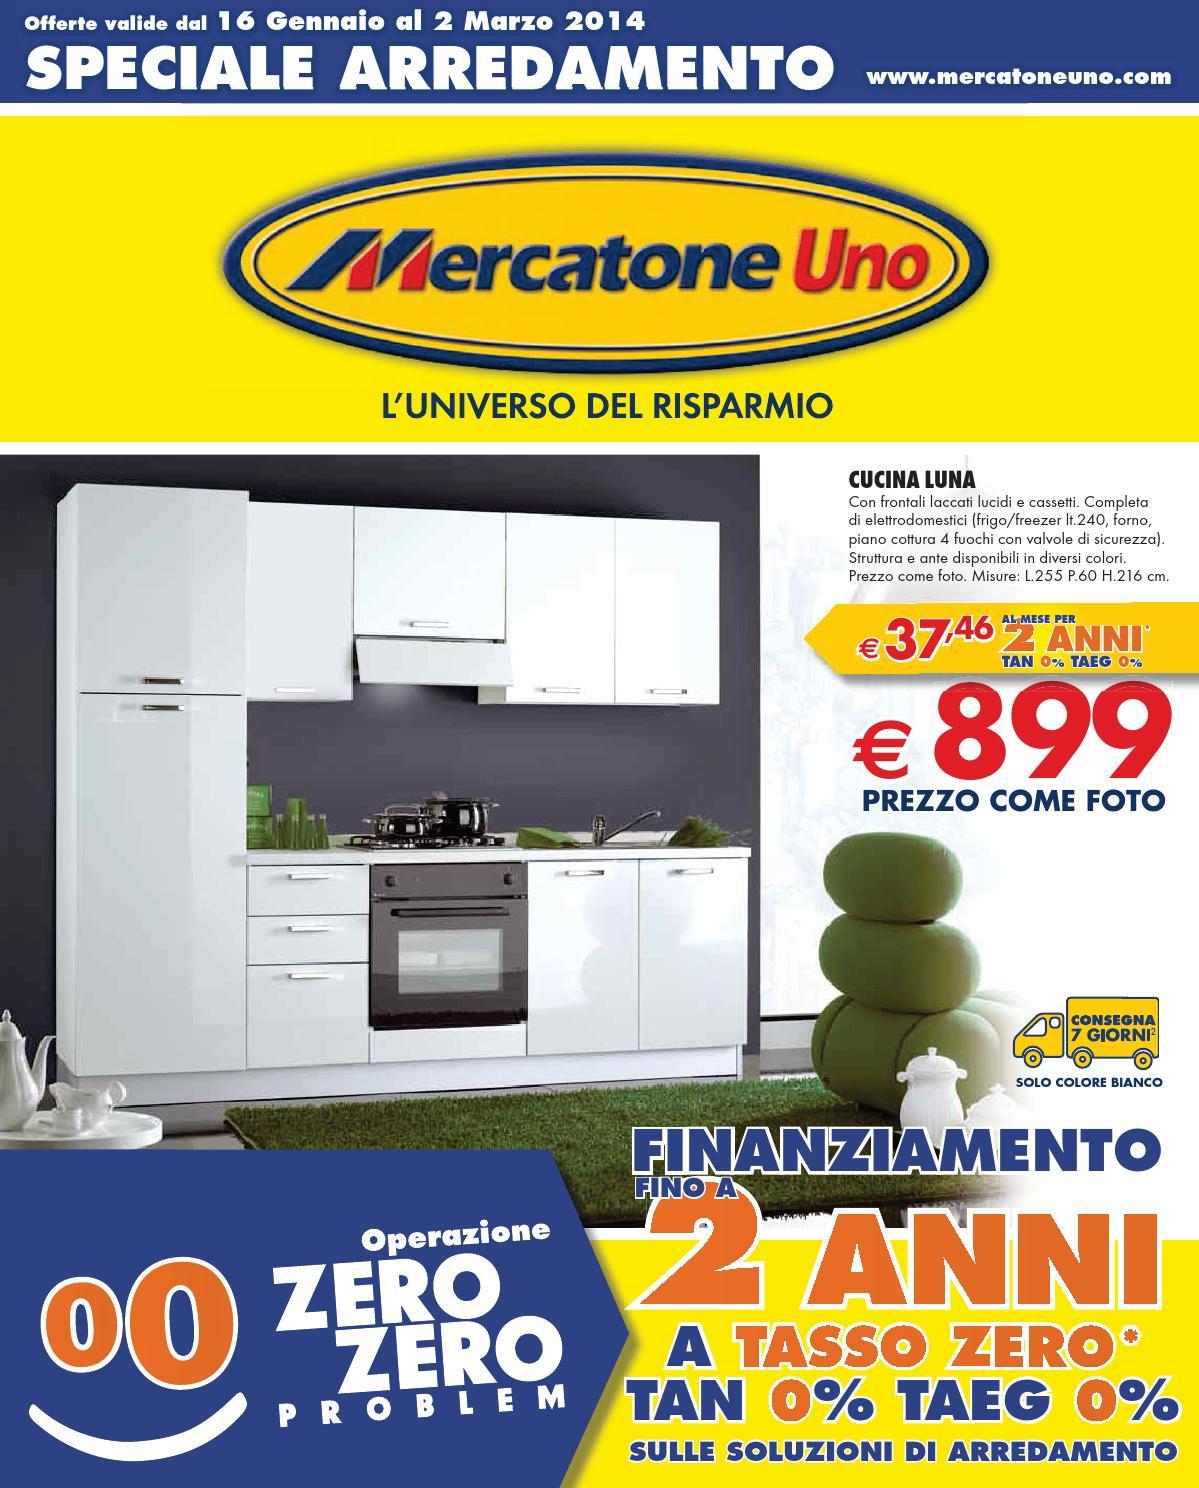 Pensili Cucina Mercatone Uno. Gallery Of Pensili Cucina Mercatone ...